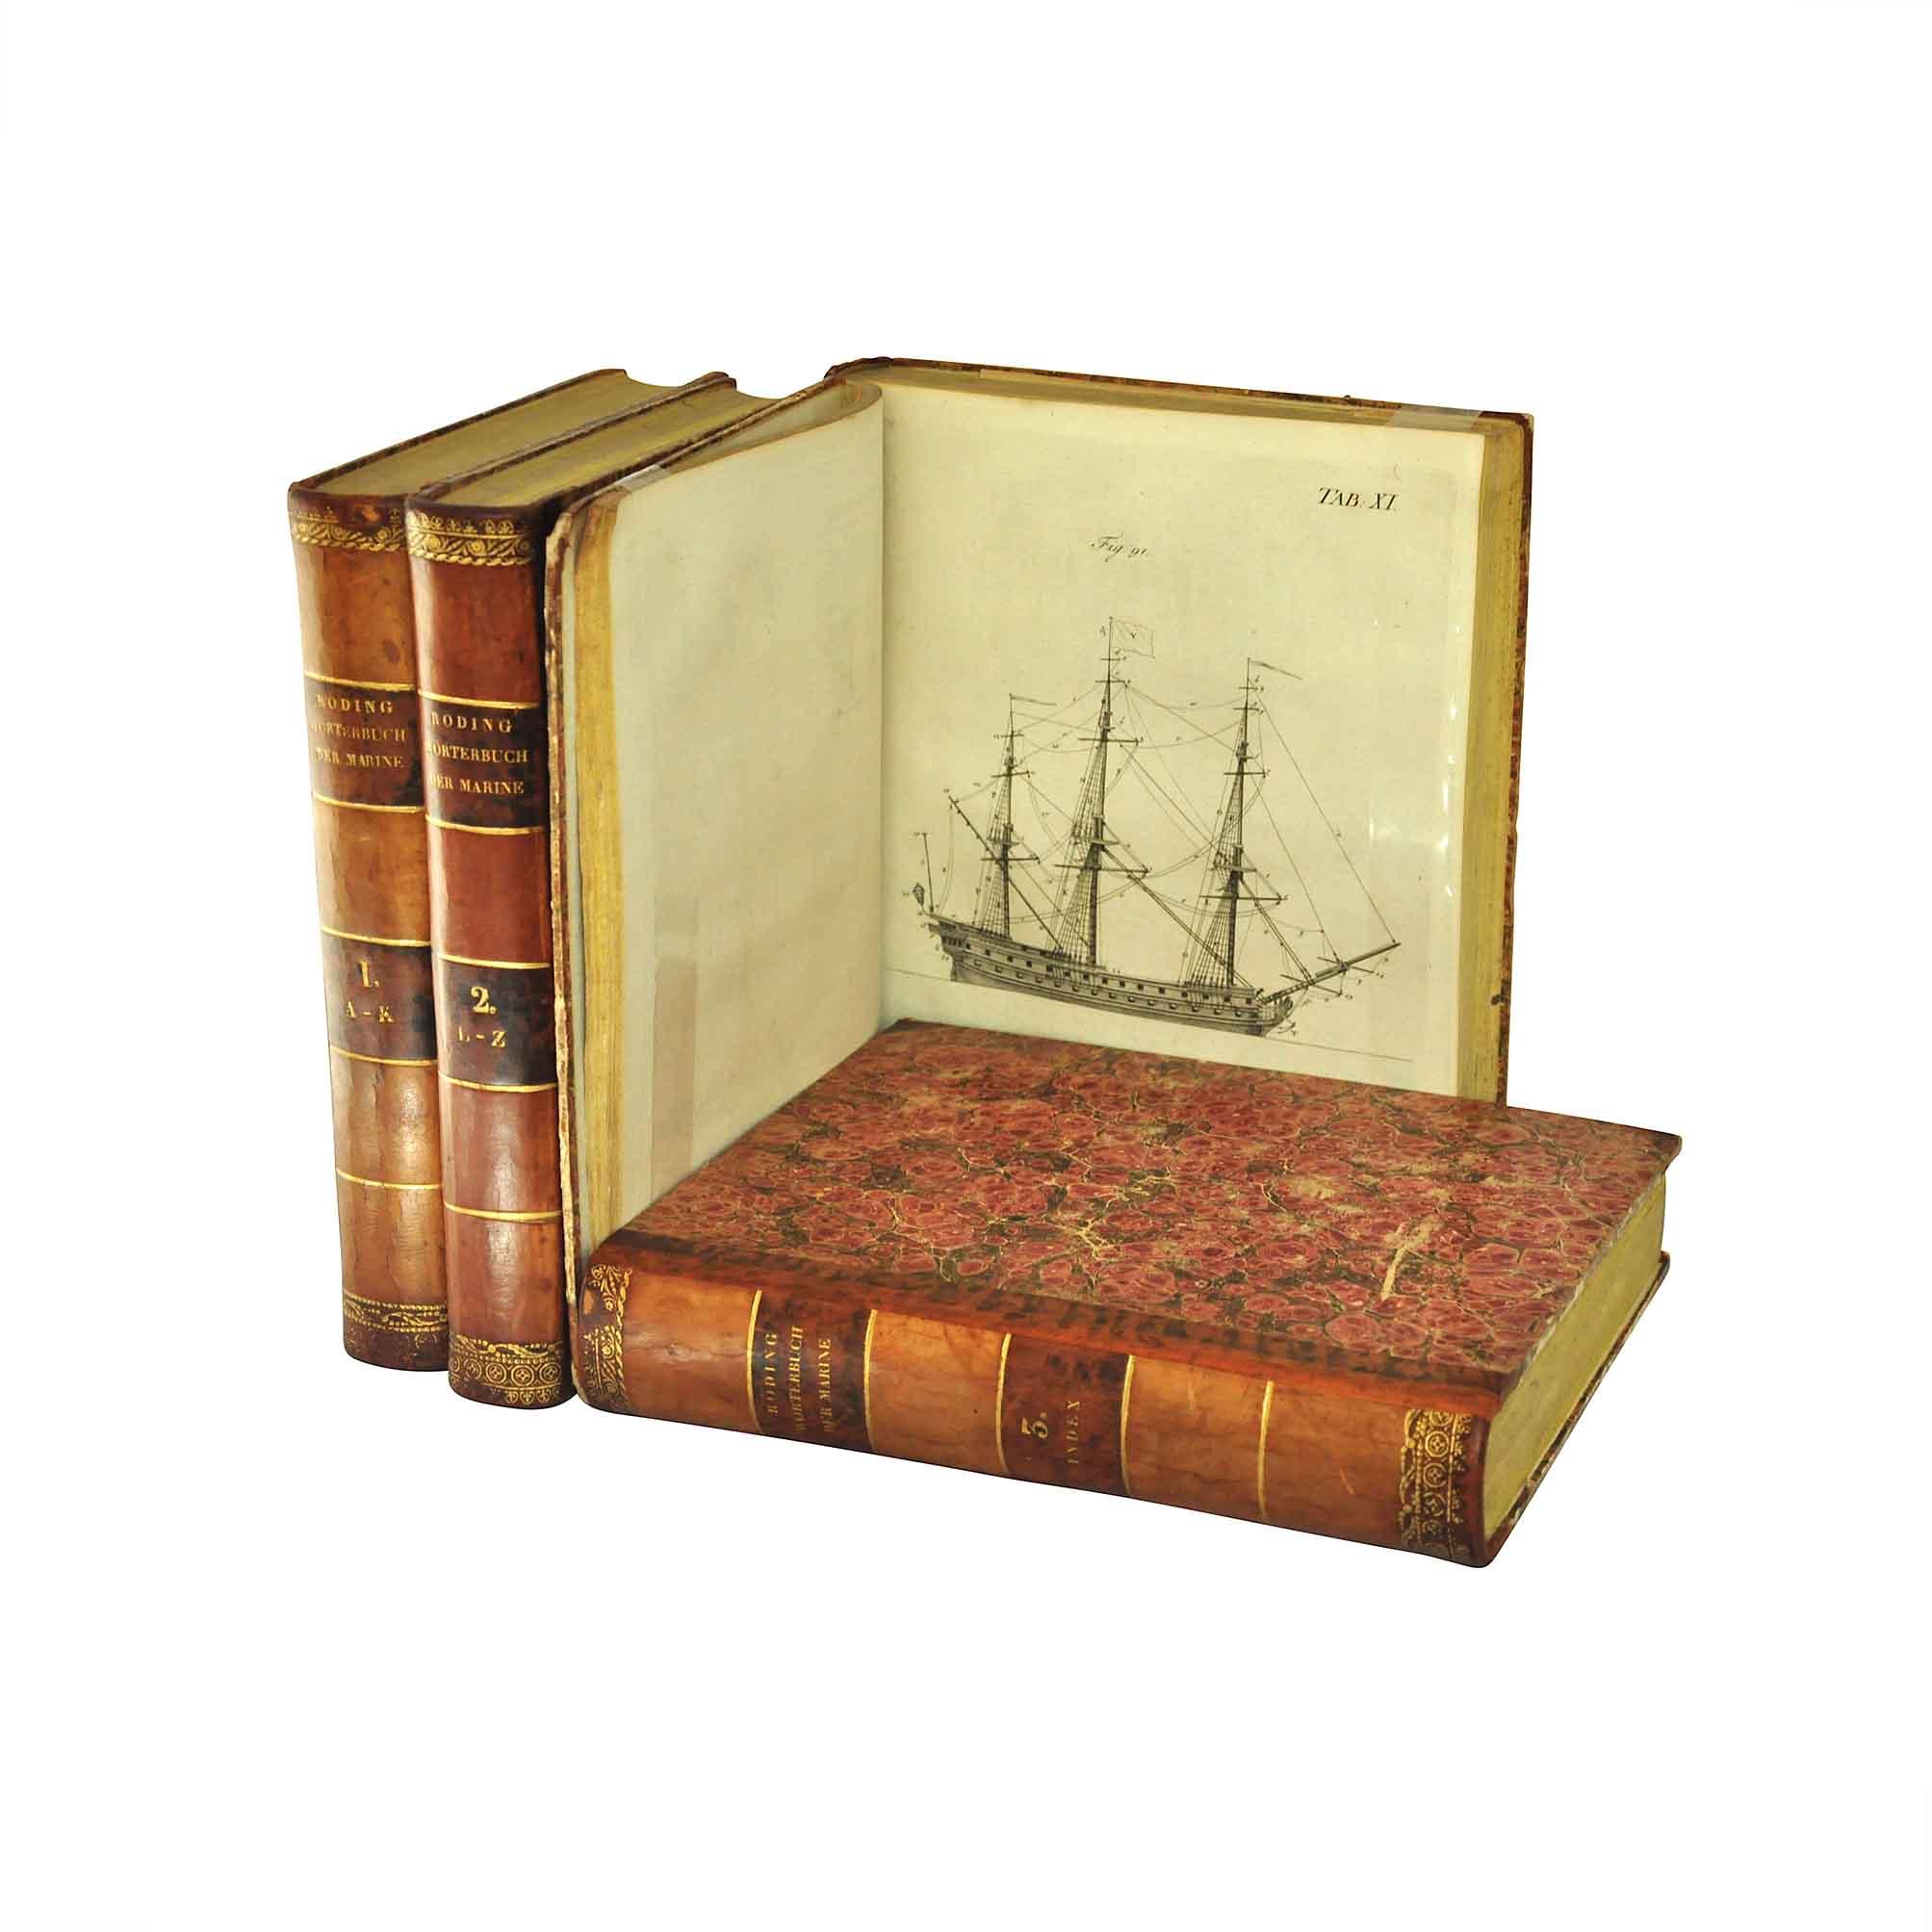 5568-Roeding-Woerterbuch-Marine-1794-1798-Covers-Ship-N.jpg